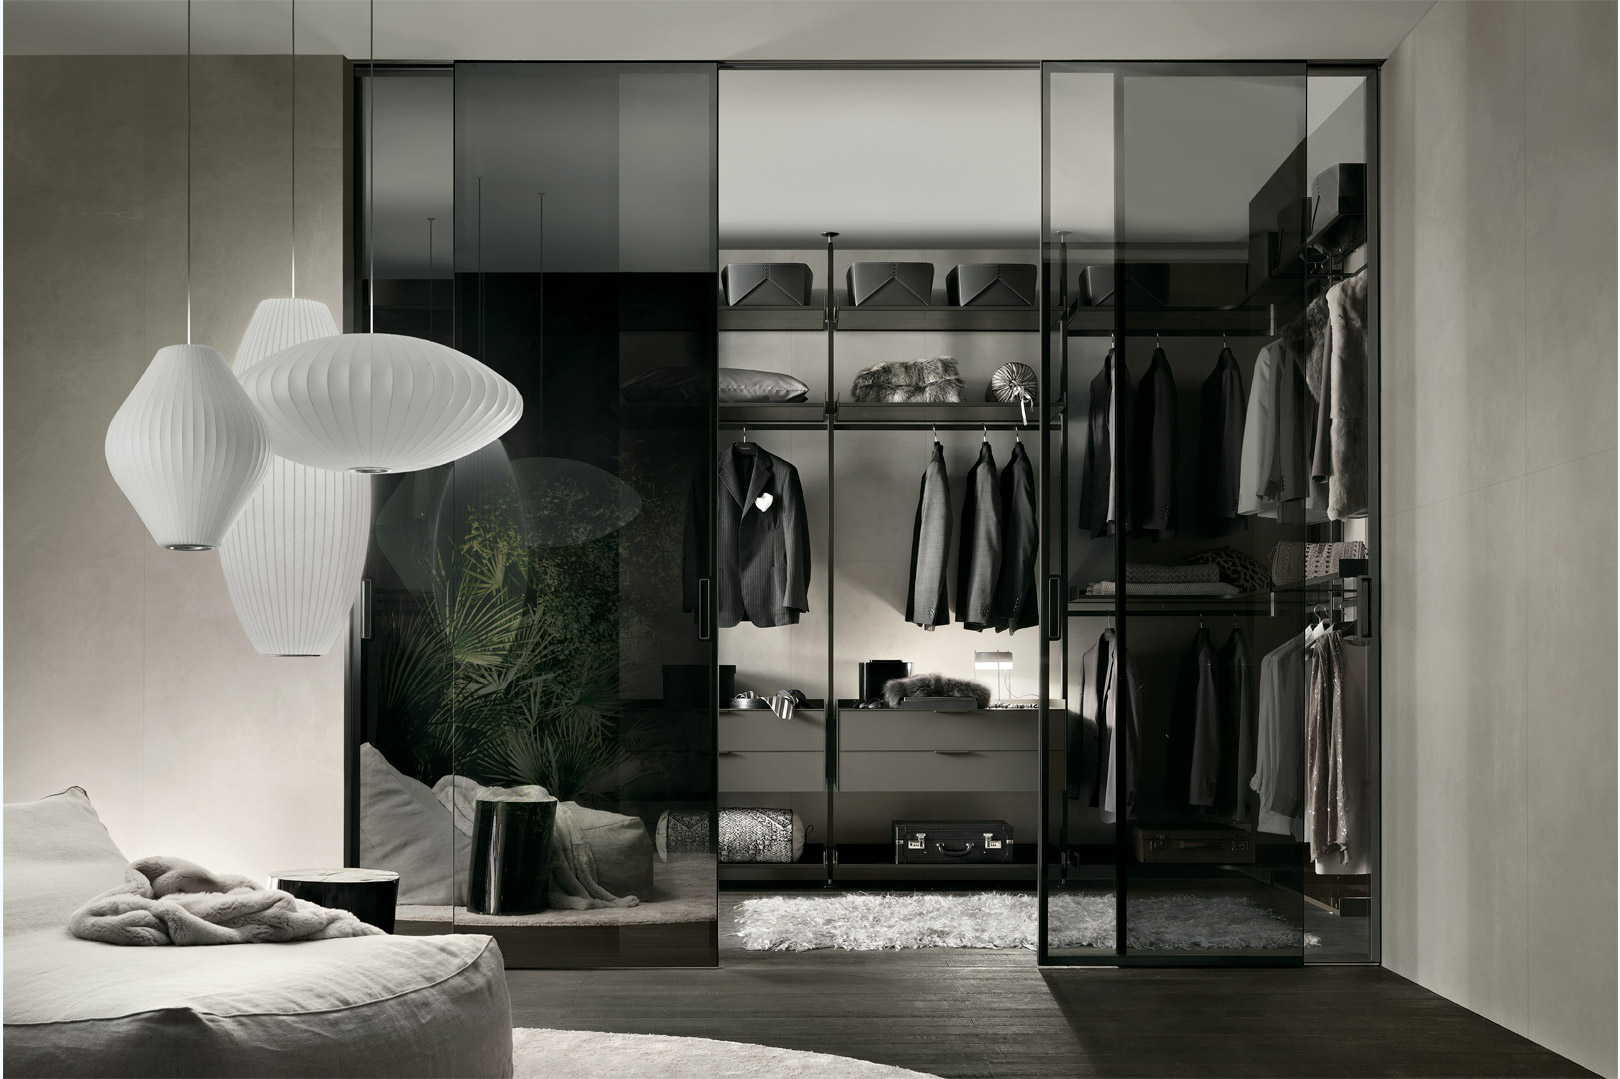 rimadesio-1620x1079 - Jan Luppes interieurs & Melles interieur